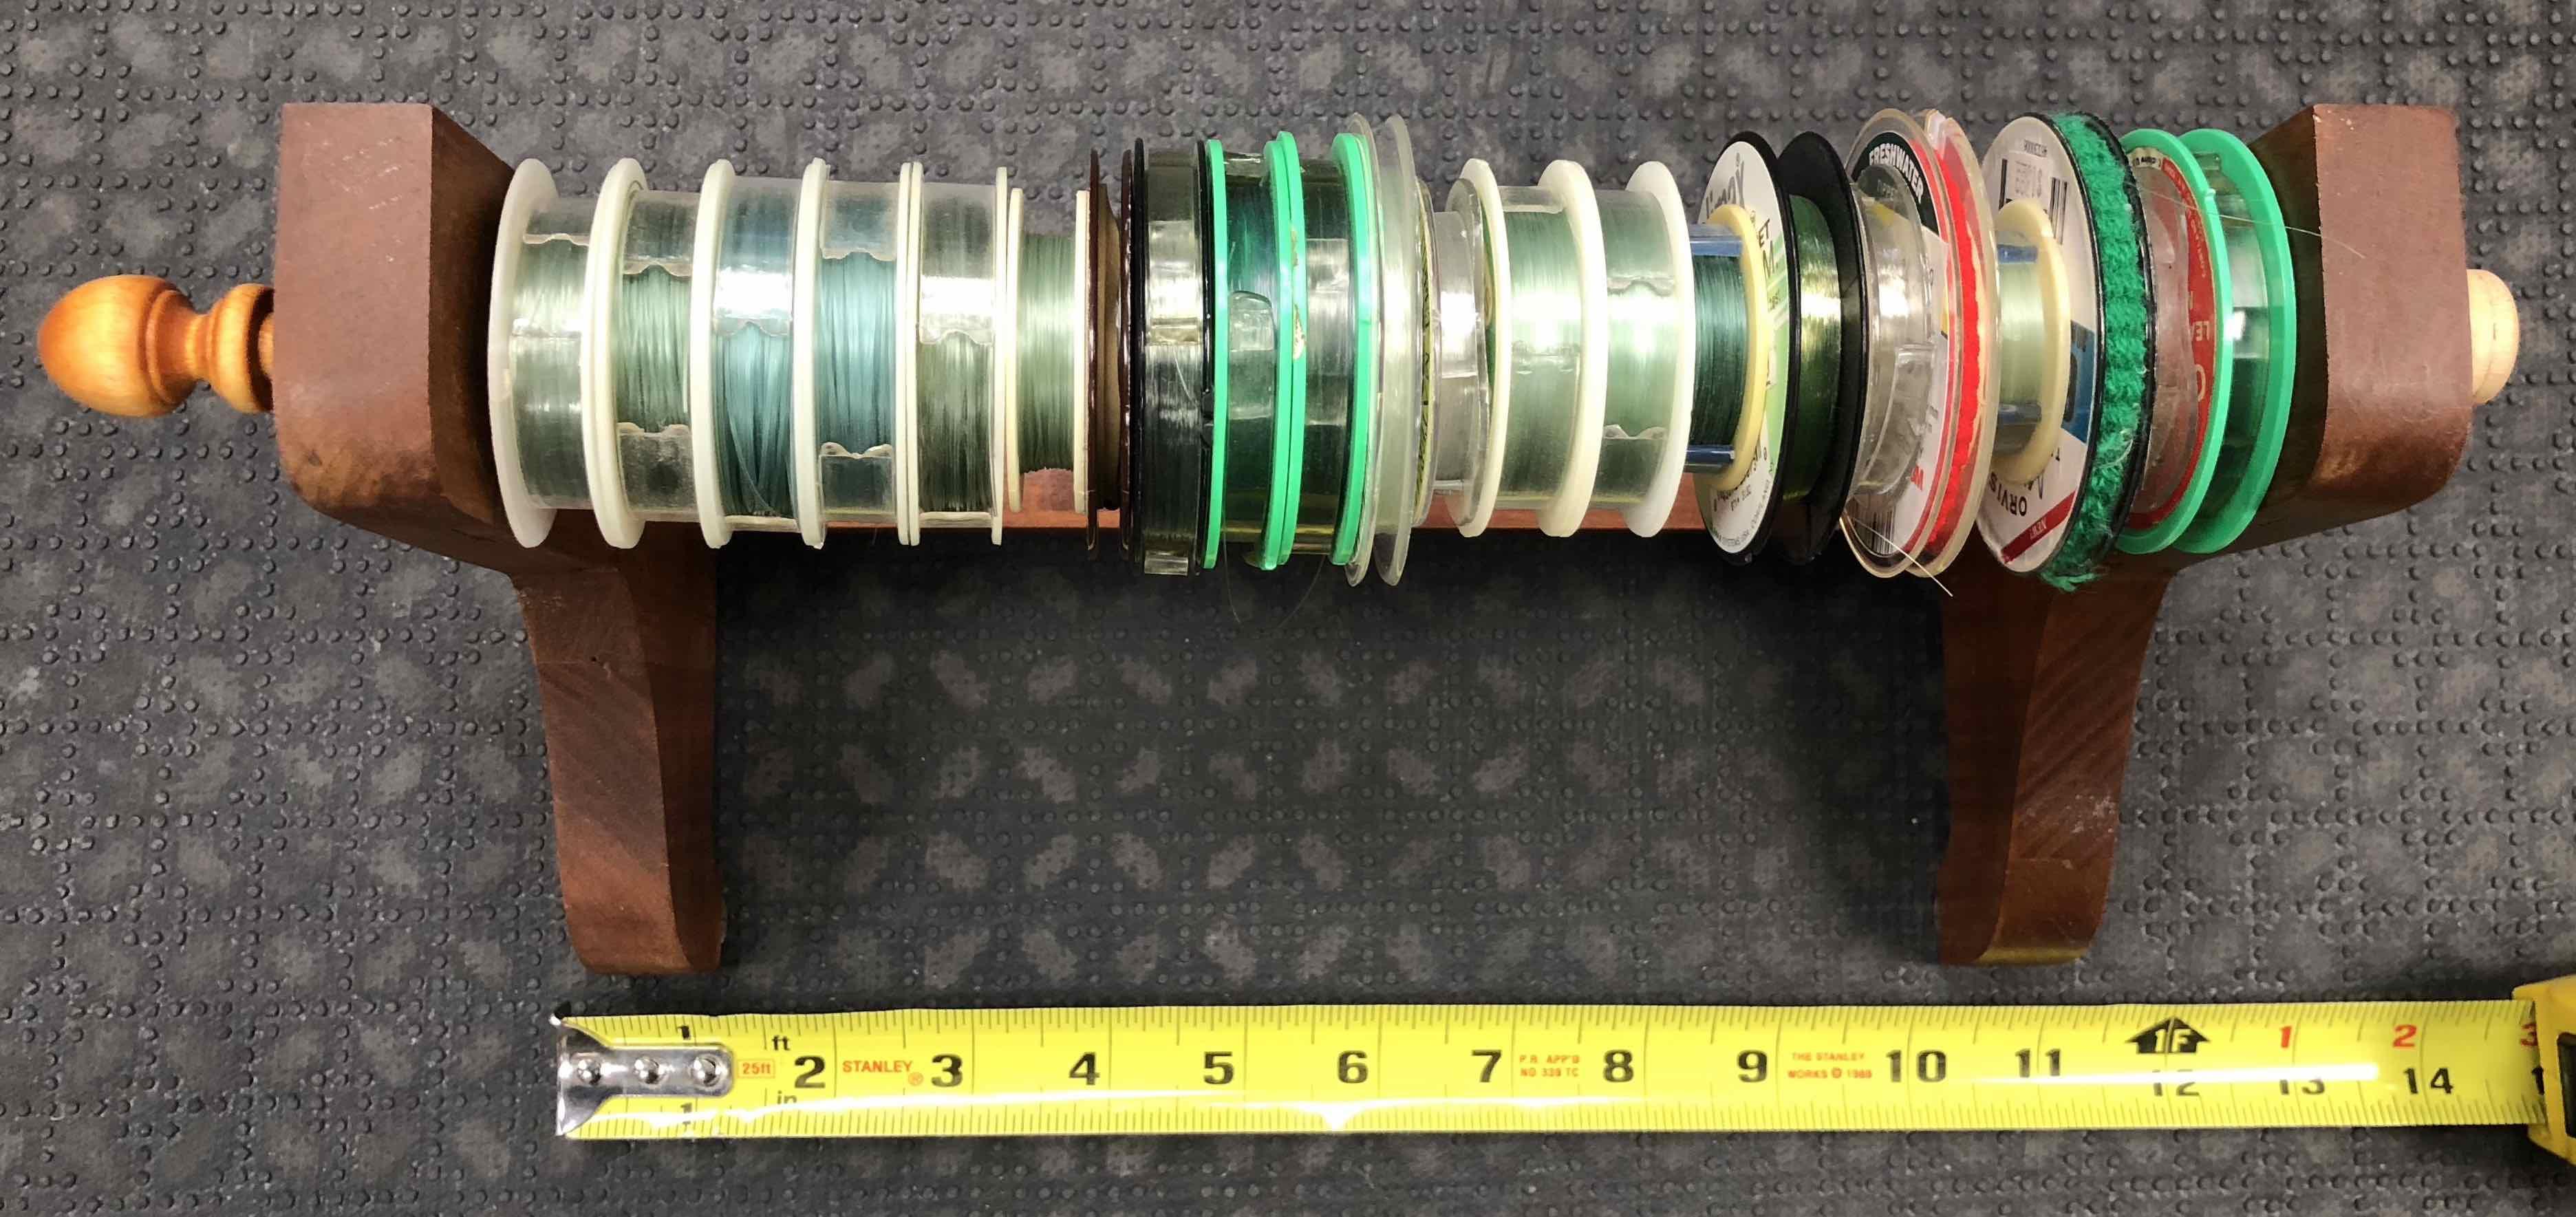 Custom Leader Tying Station c/w 22 Tippet Spools - GREAT IDEA! - $15